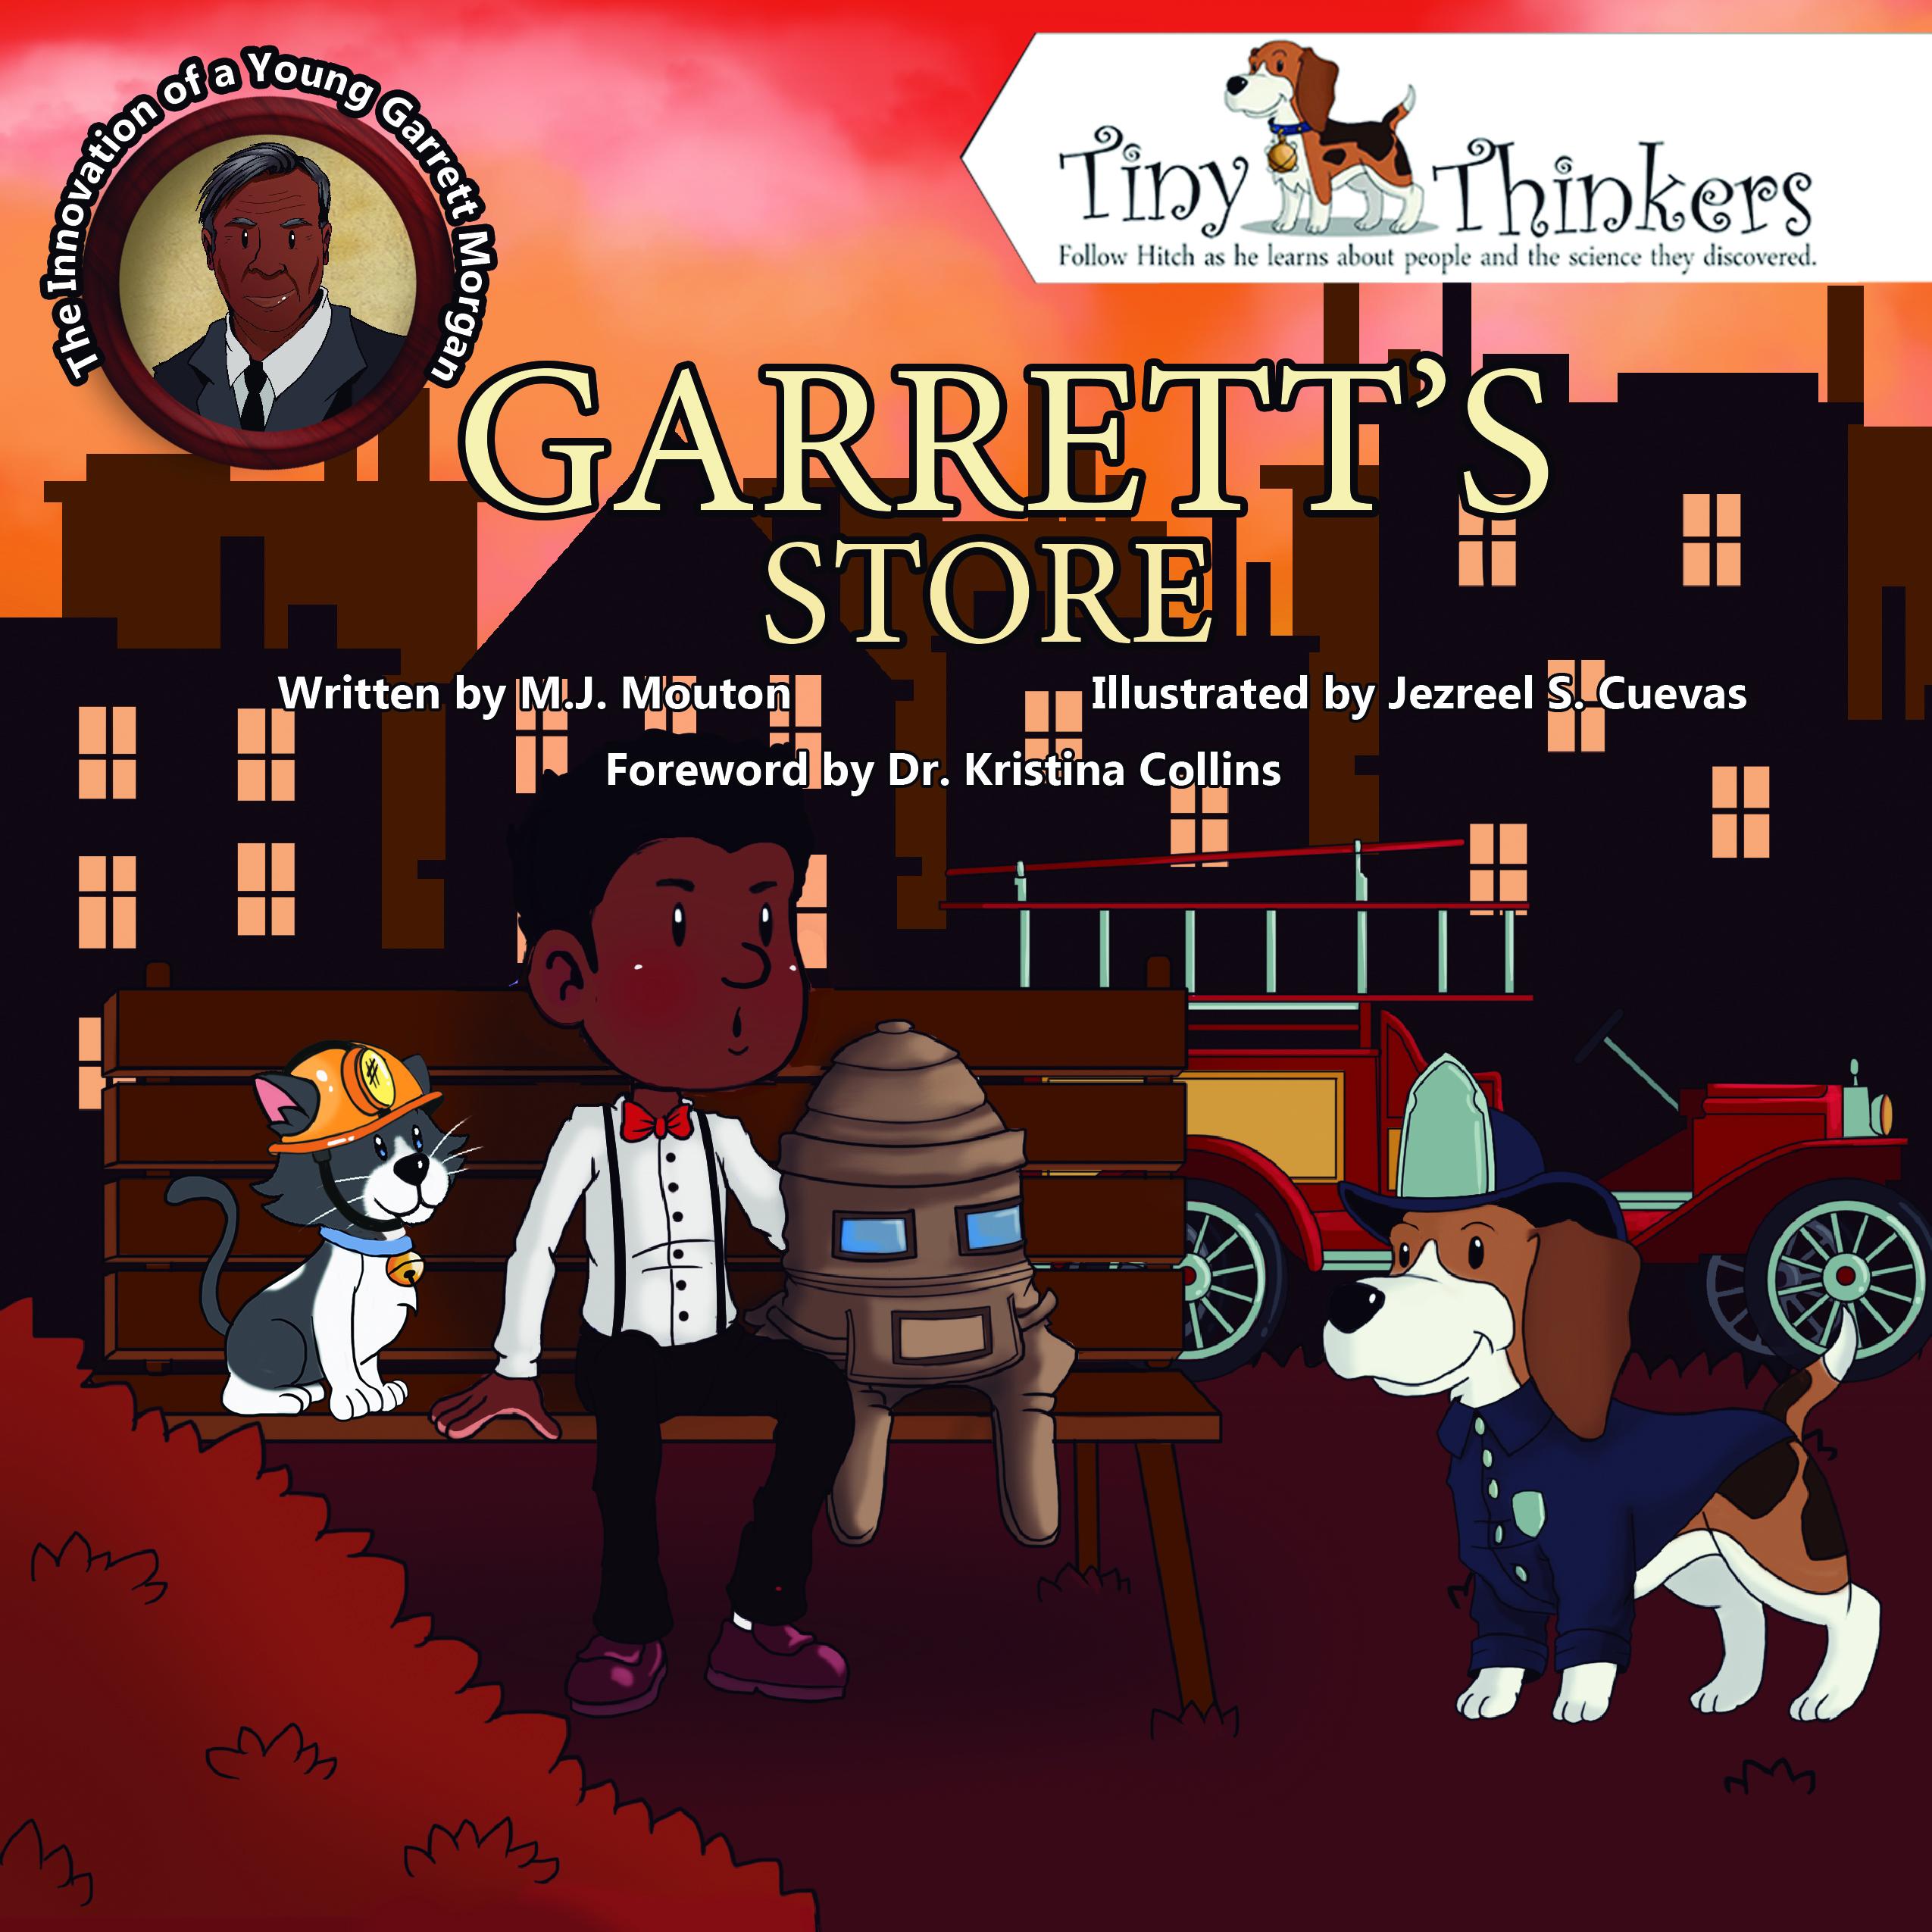 Garrett's Store: The Ingenuity of a Young Garrett Morgan